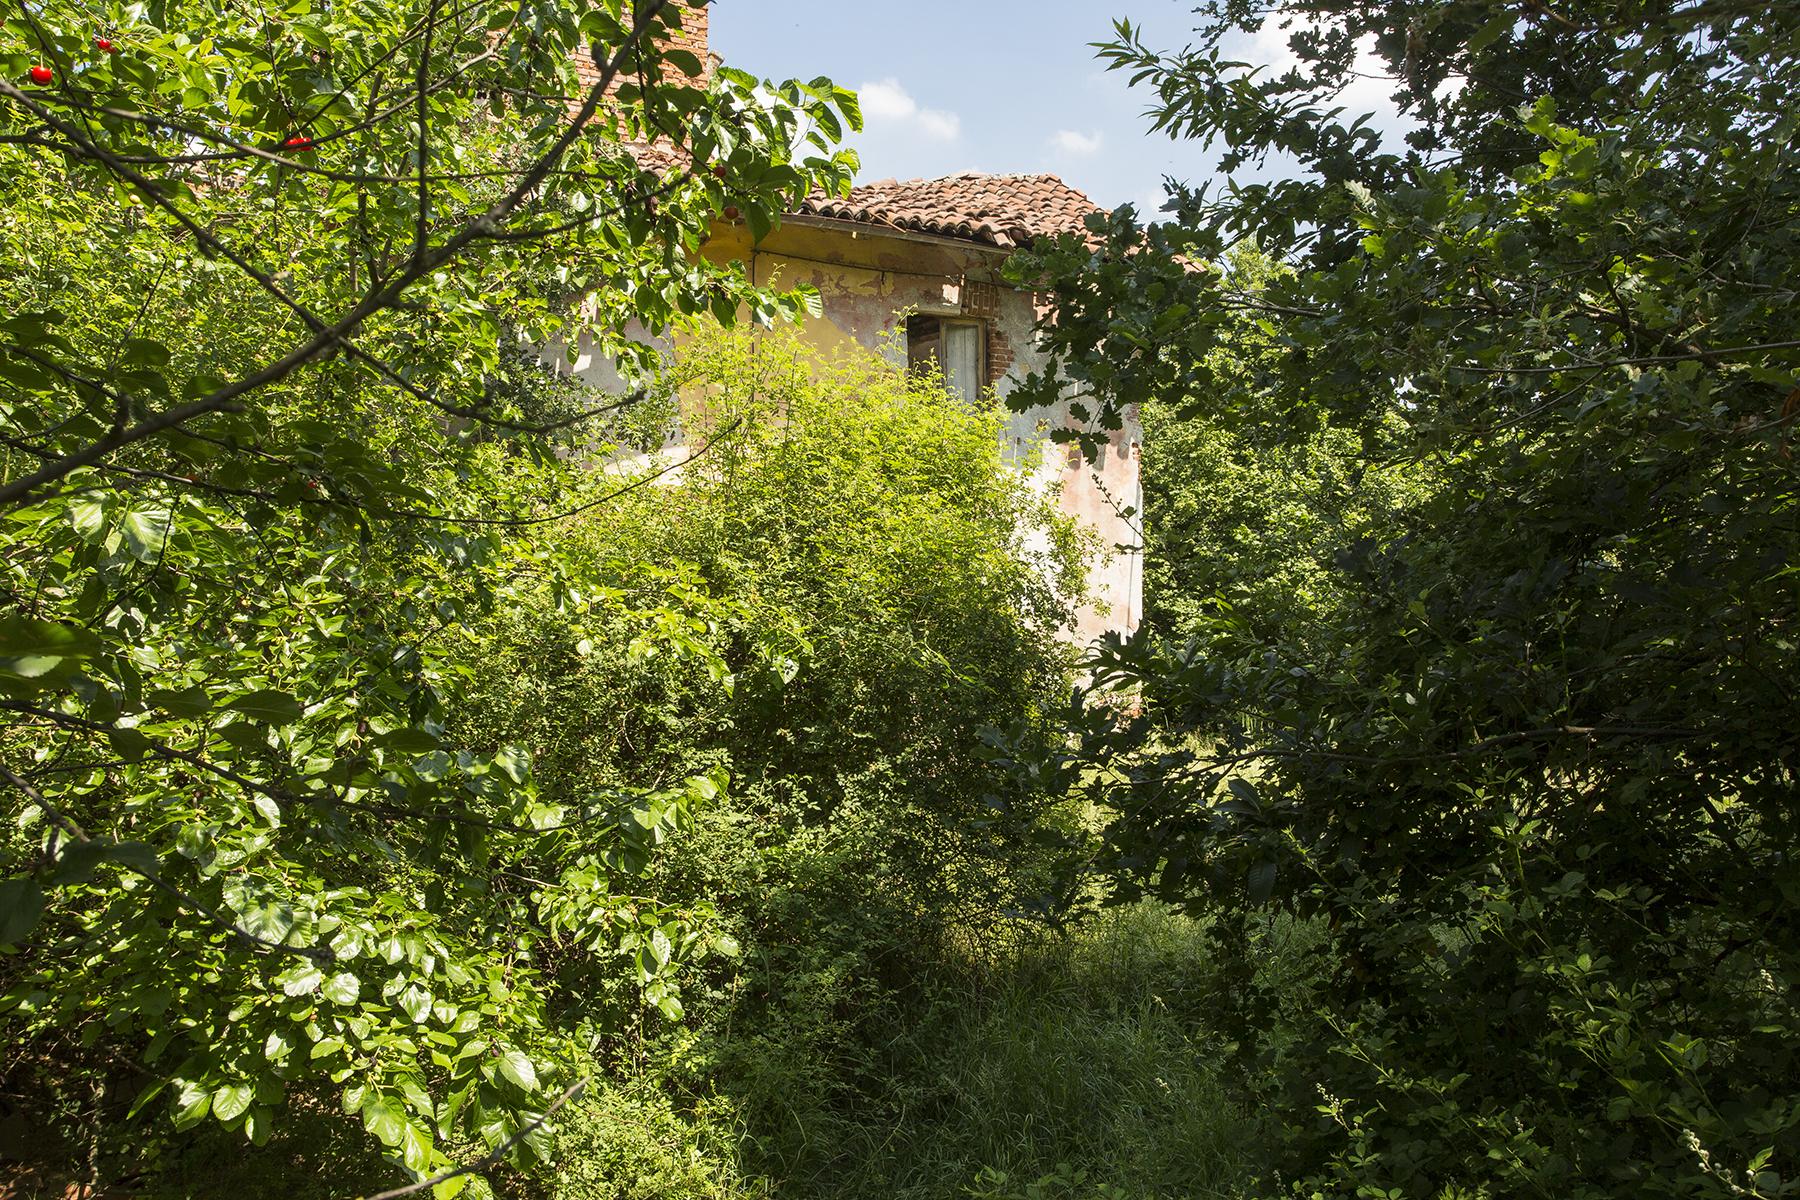 Rustico in Vendita a Novi Ligure: 5 locali, 300 mq - Foto 6